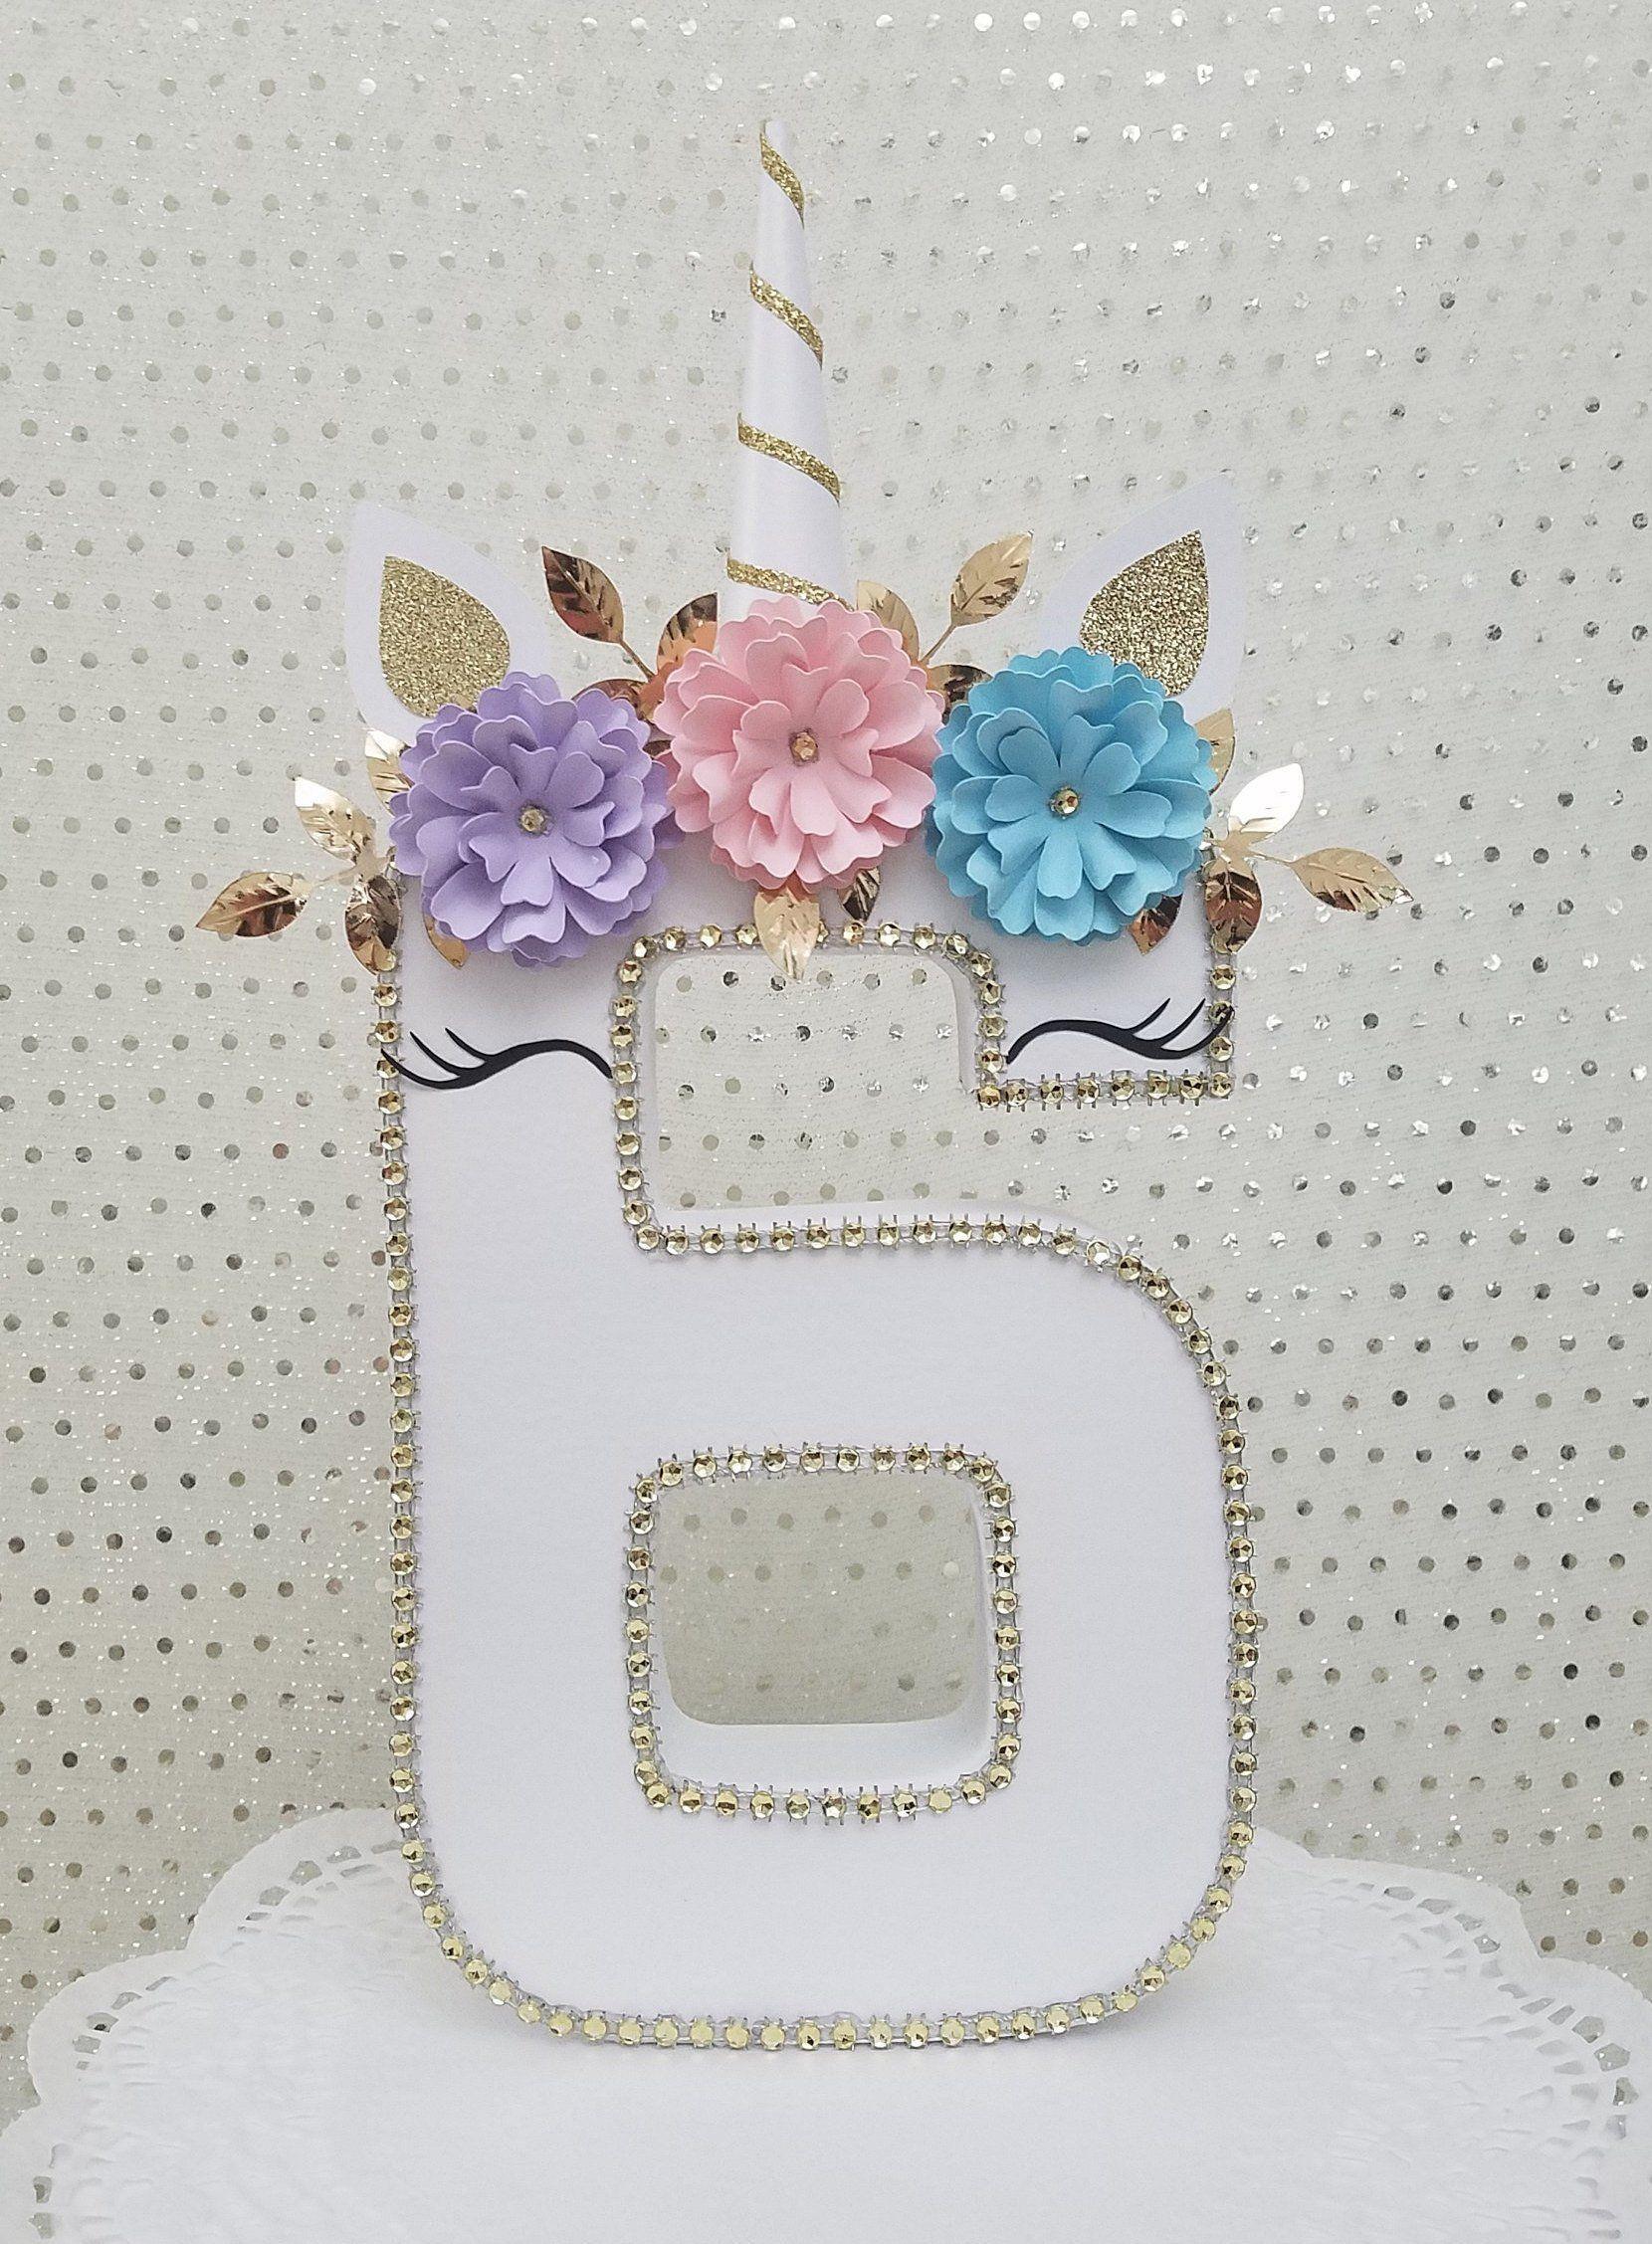 Photo of Unicorn party decorations, Unicorn birthday, Unicorn decorations, Paper flowers, Home decor, bedroom decor, Unicorn photo prop